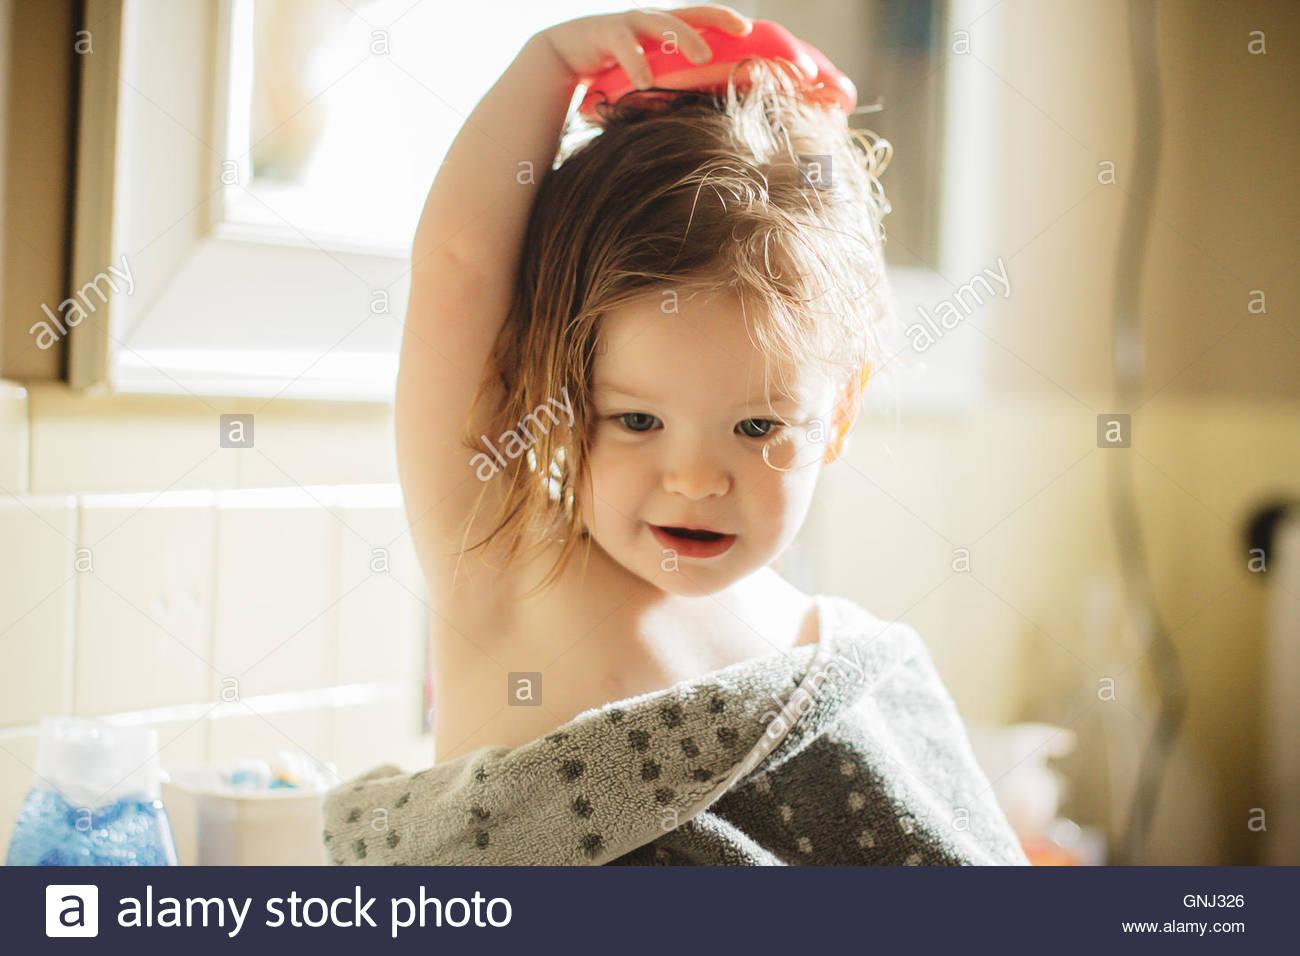 Bürsten ihr nasses Haar nach einem Bad Girl Stockbild